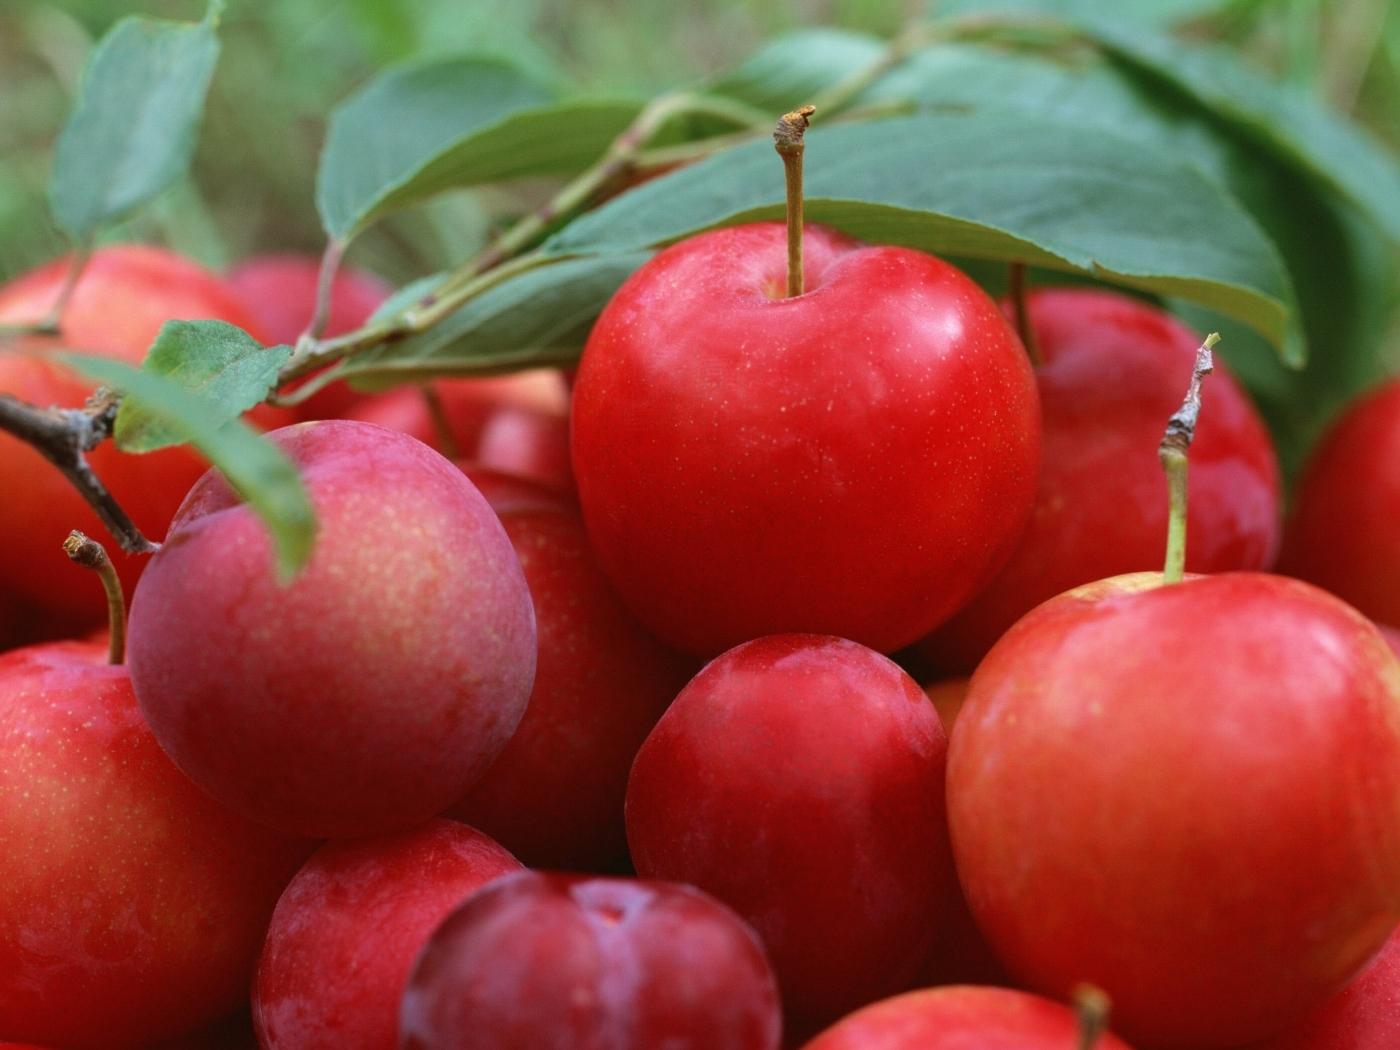 Handy-Wallpaper Obst, Lebensmittel kostenlos herunterladen.